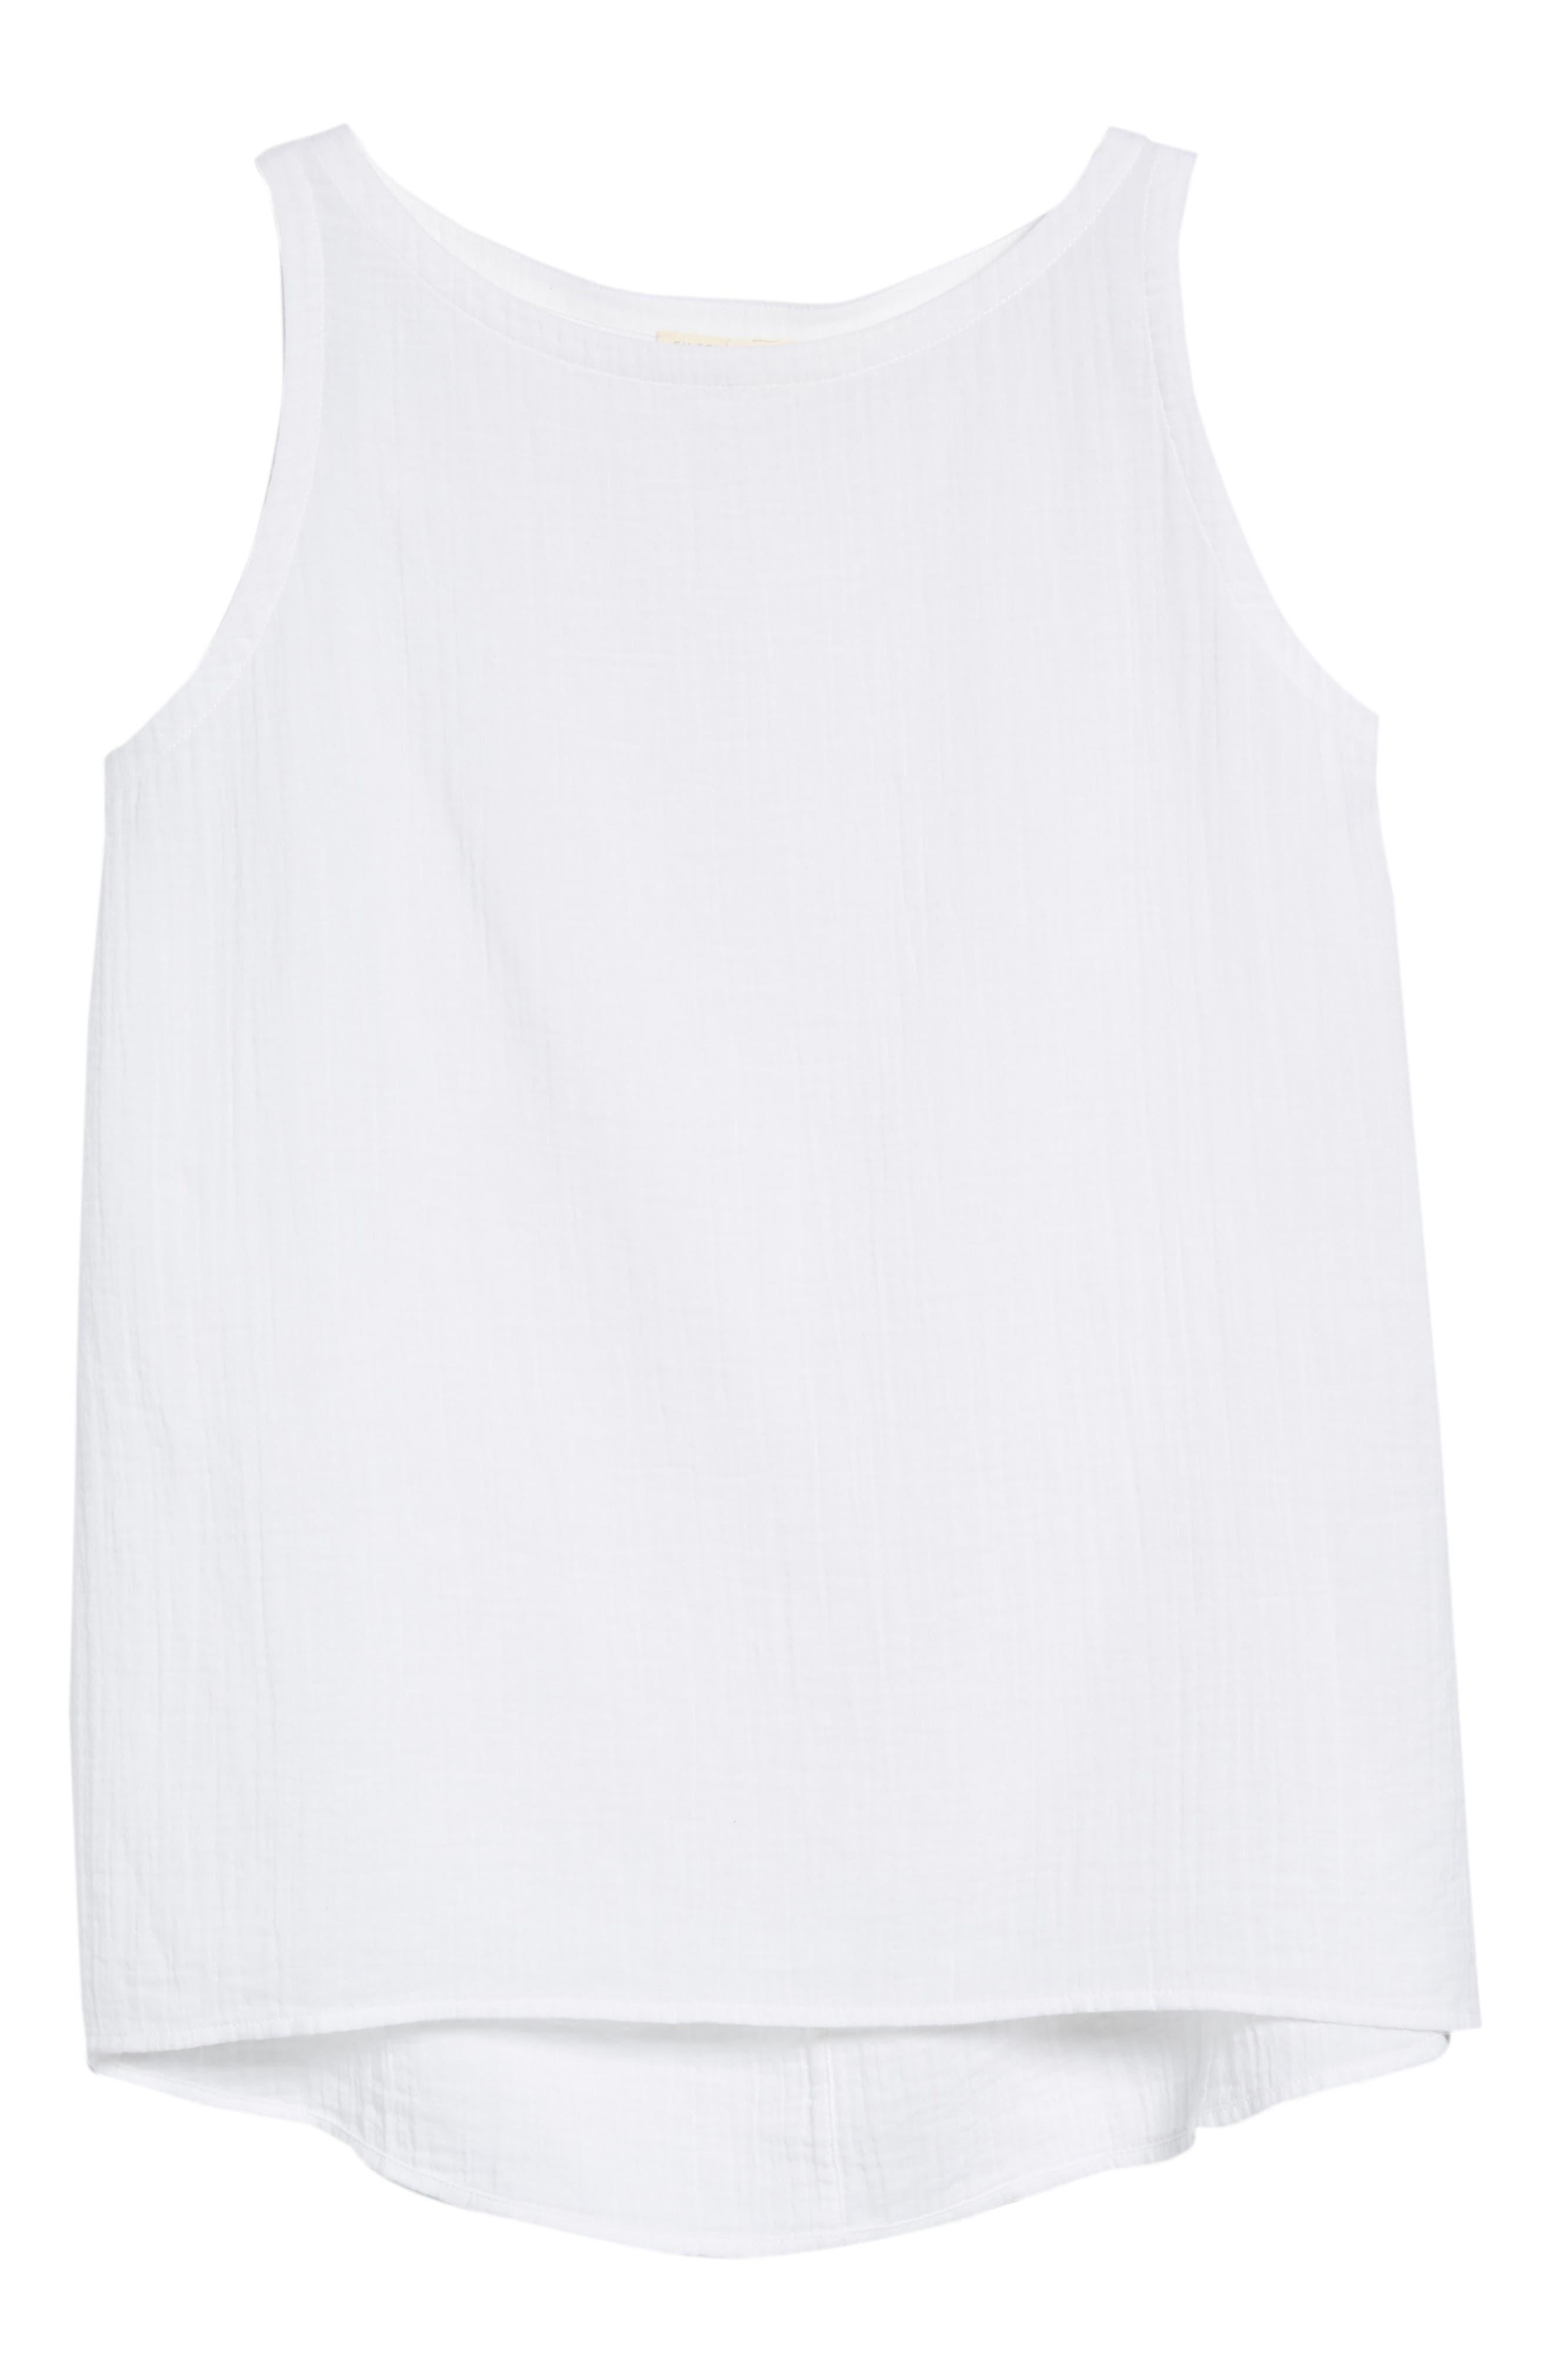 Organic Cotton Swing Shell,                             Alternate thumbnail 6, color,                             100